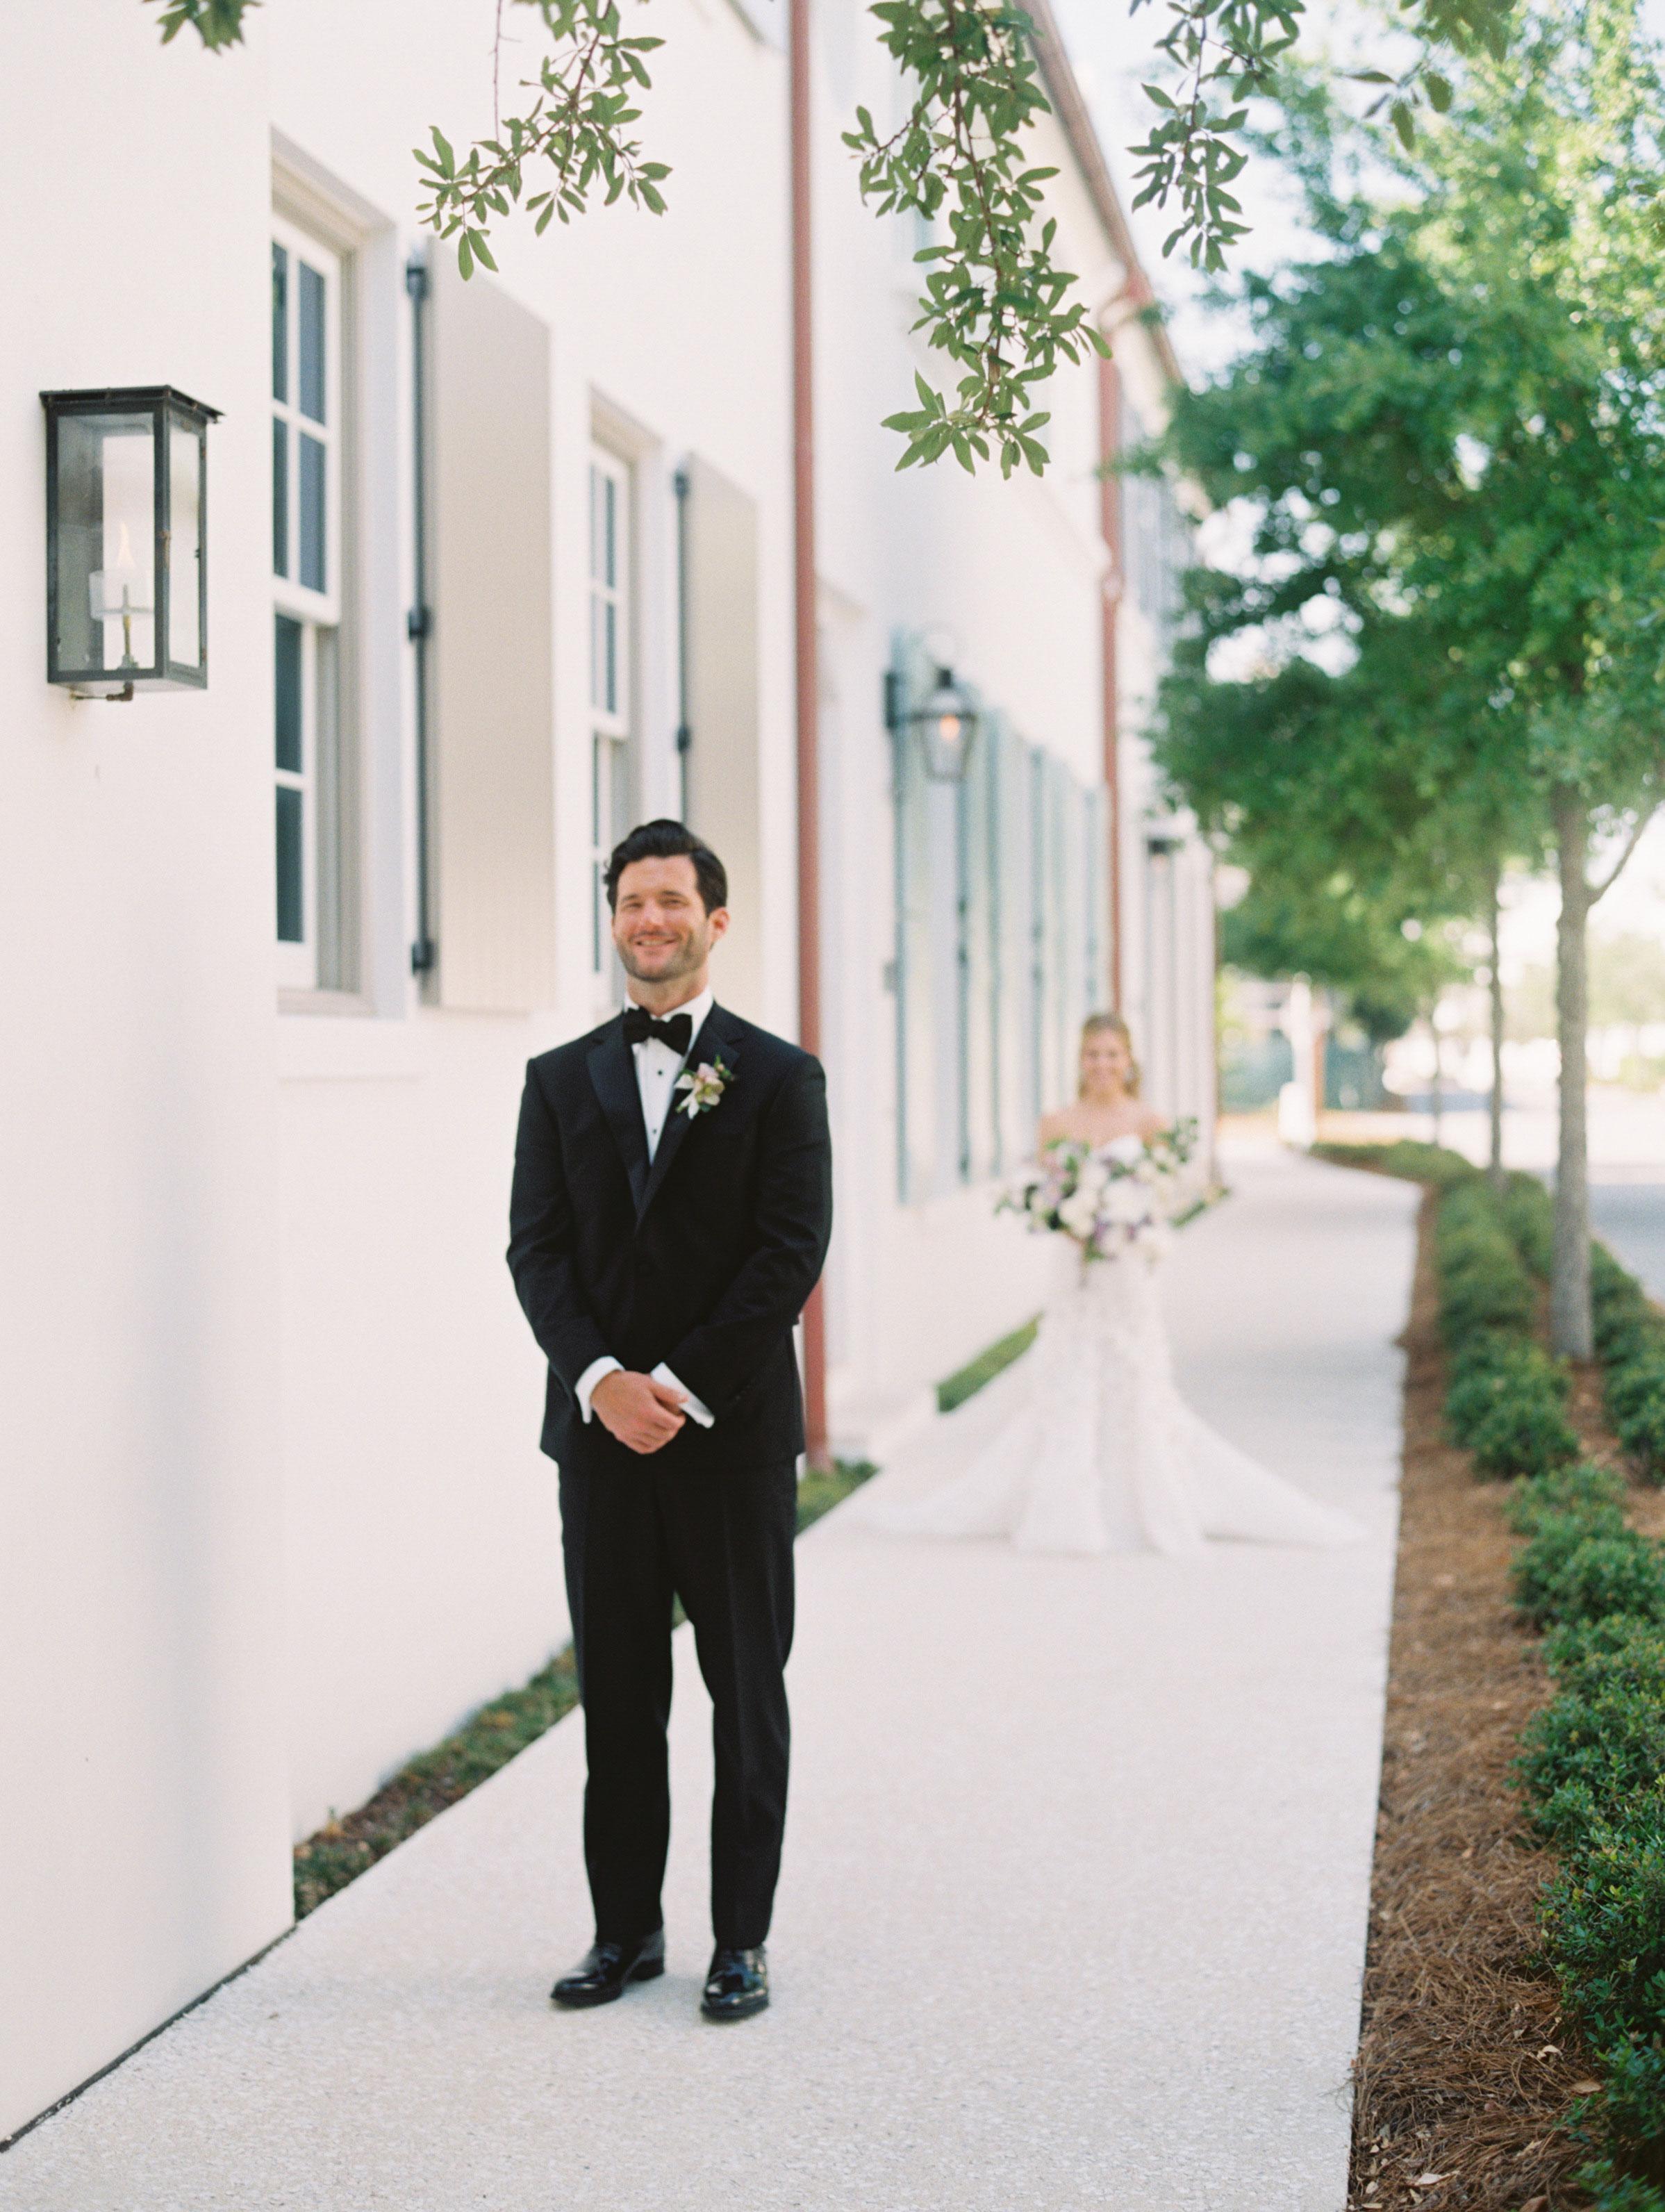 leighton craig wedding first look